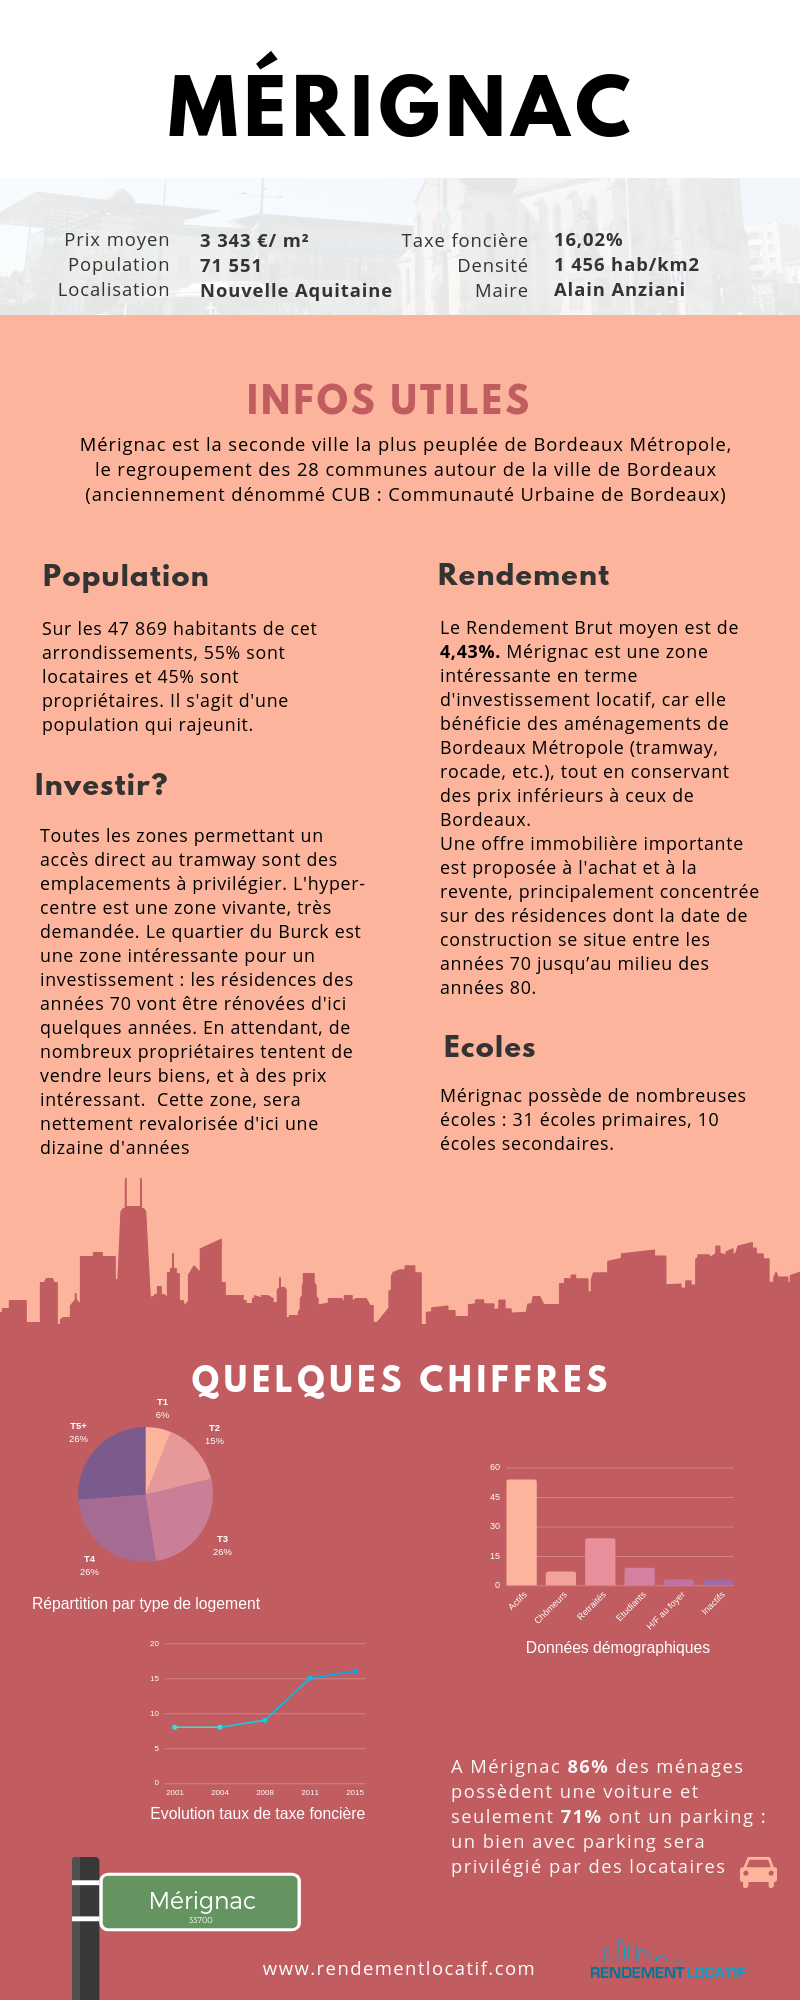 Investissement Locatif A Merignac L Analyse De Max Guyver Investissement Immobilier Locatif Investissement Immobilier Et Taxe Fonciere